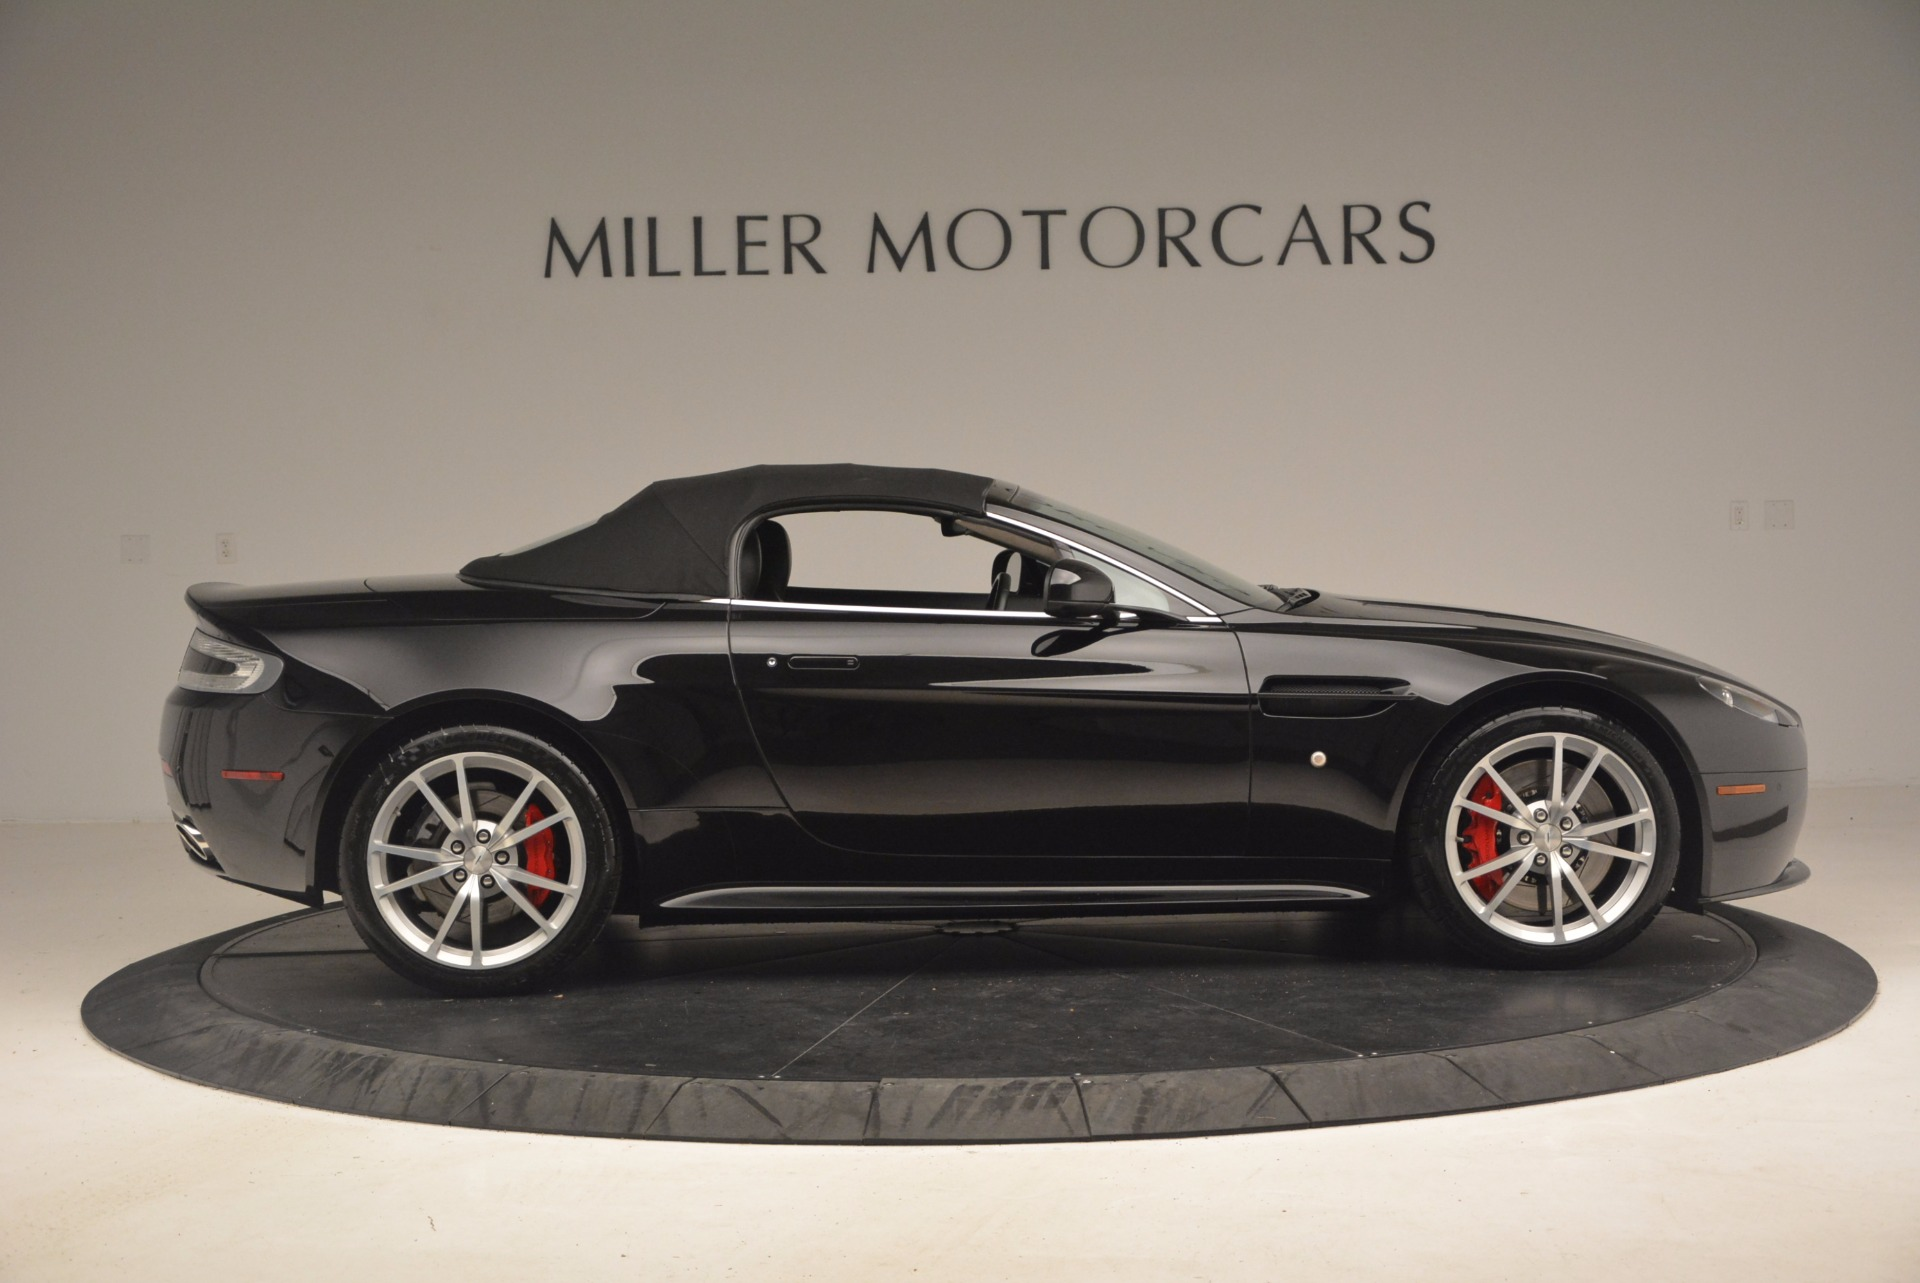 Used 2012 Aston Martin V8 Vantage S Roadster For Sale In Greenwich, CT. Alfa Romeo of Greenwich, 4328A 1181_p21